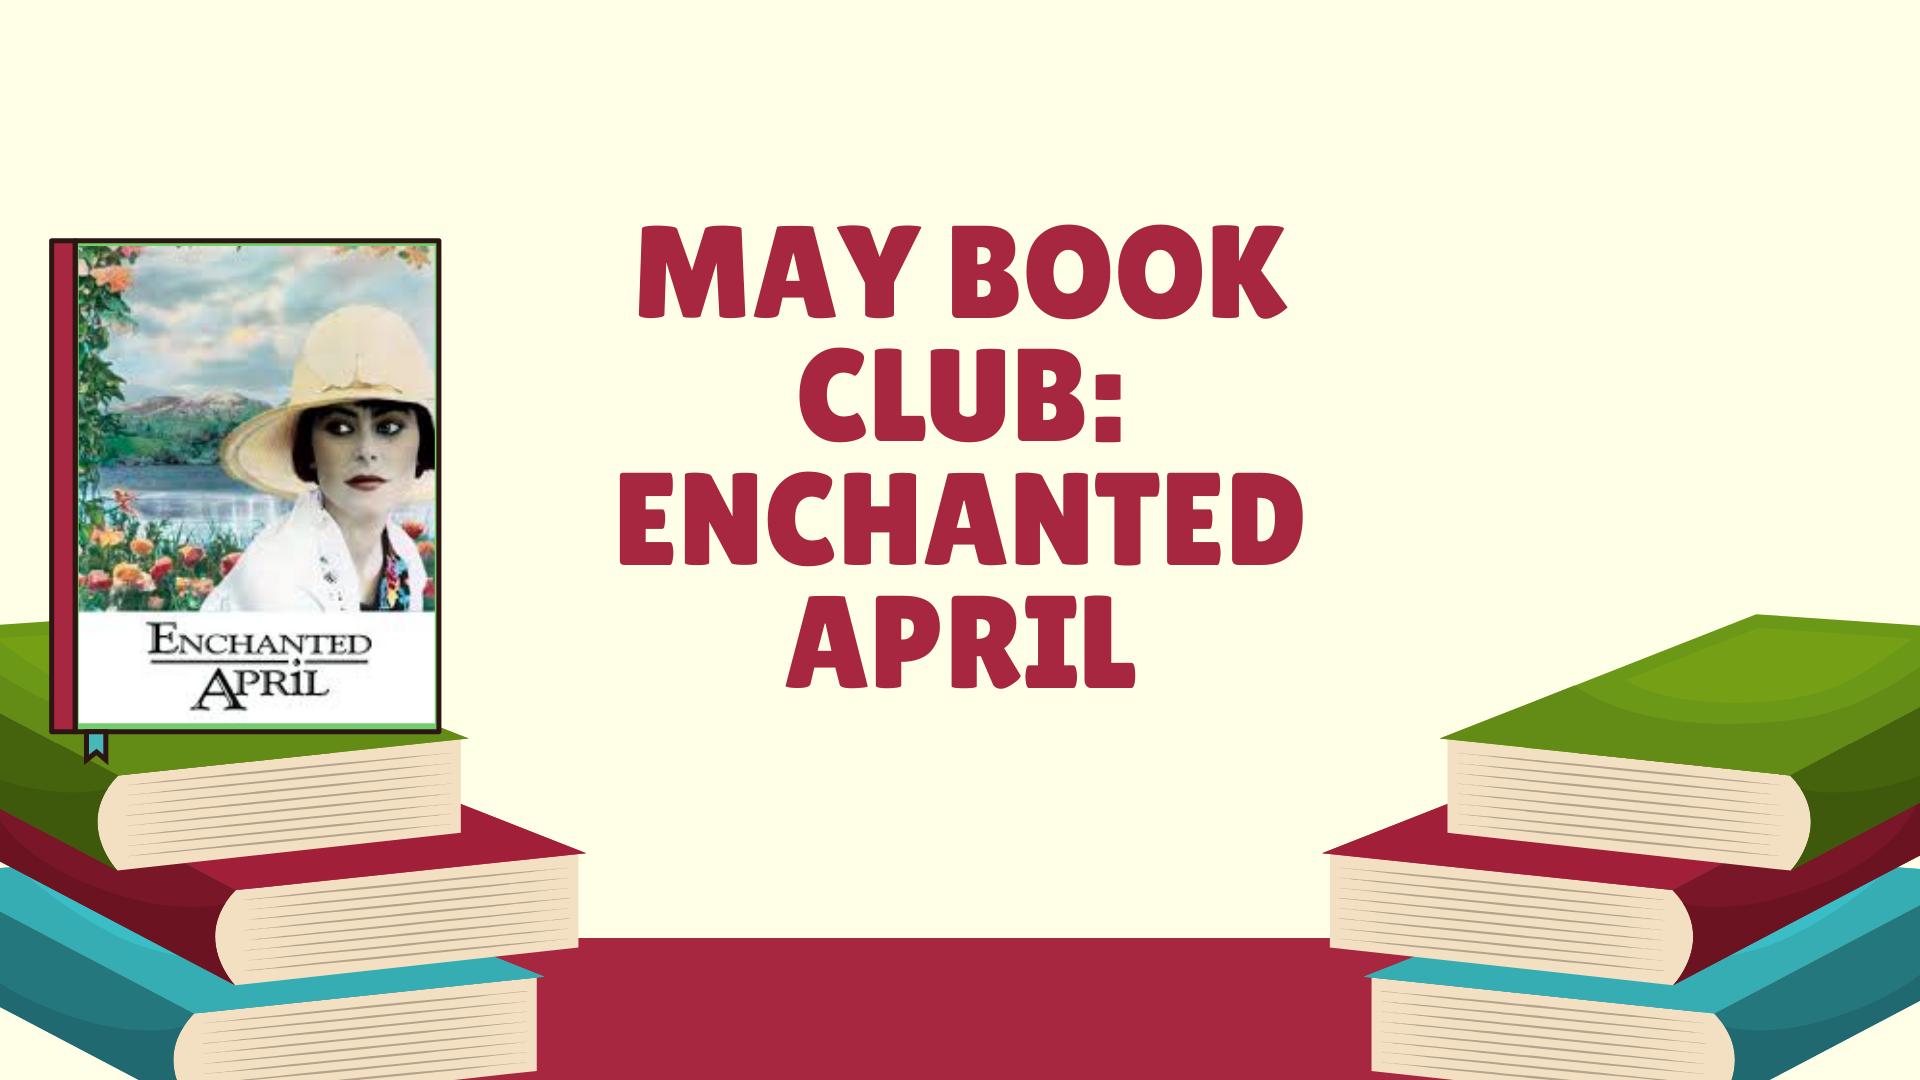 Book Club Movie - Enchanted April